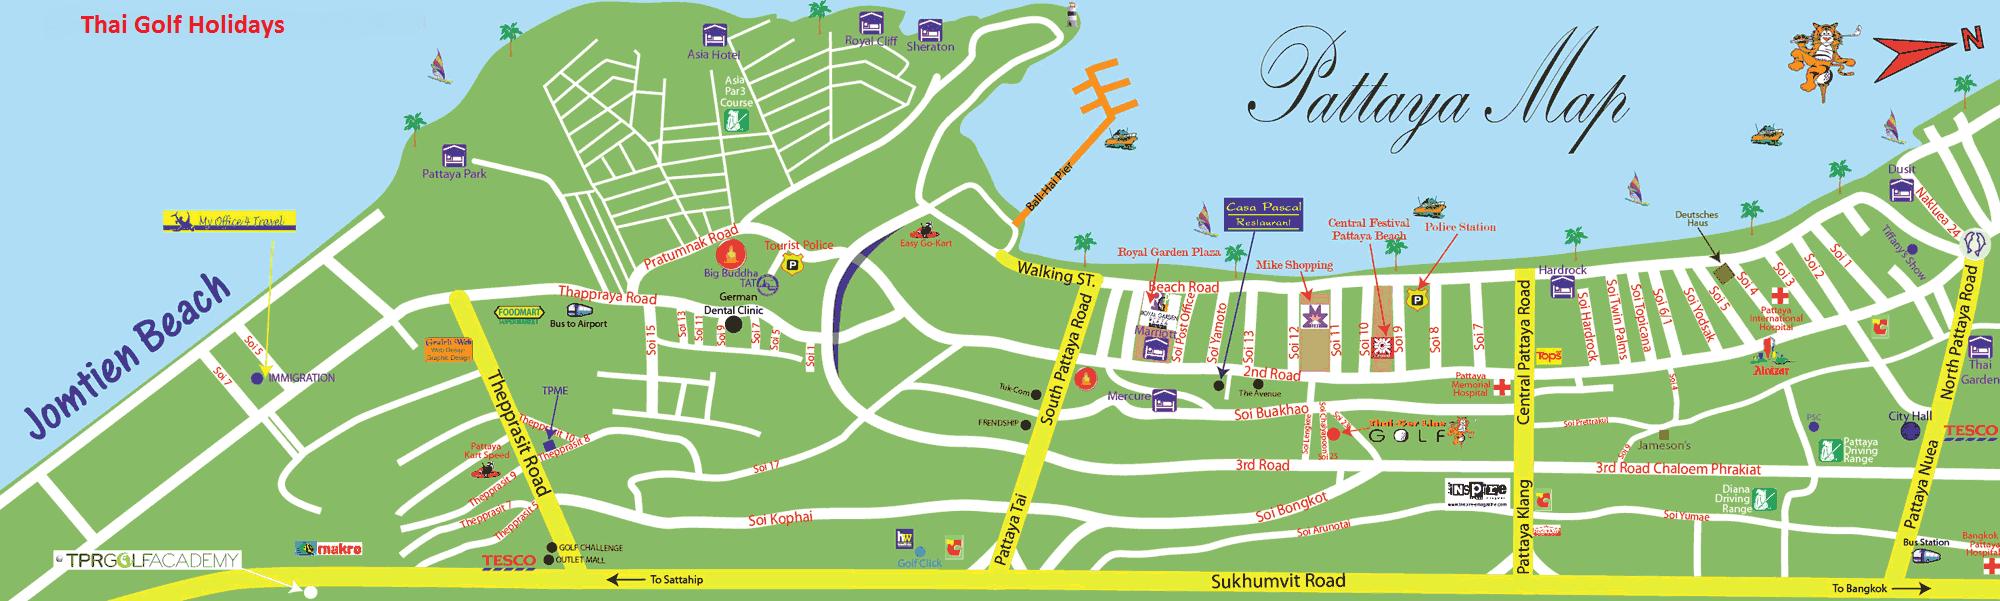 Map of Pattaya – Thai Golf Holidays